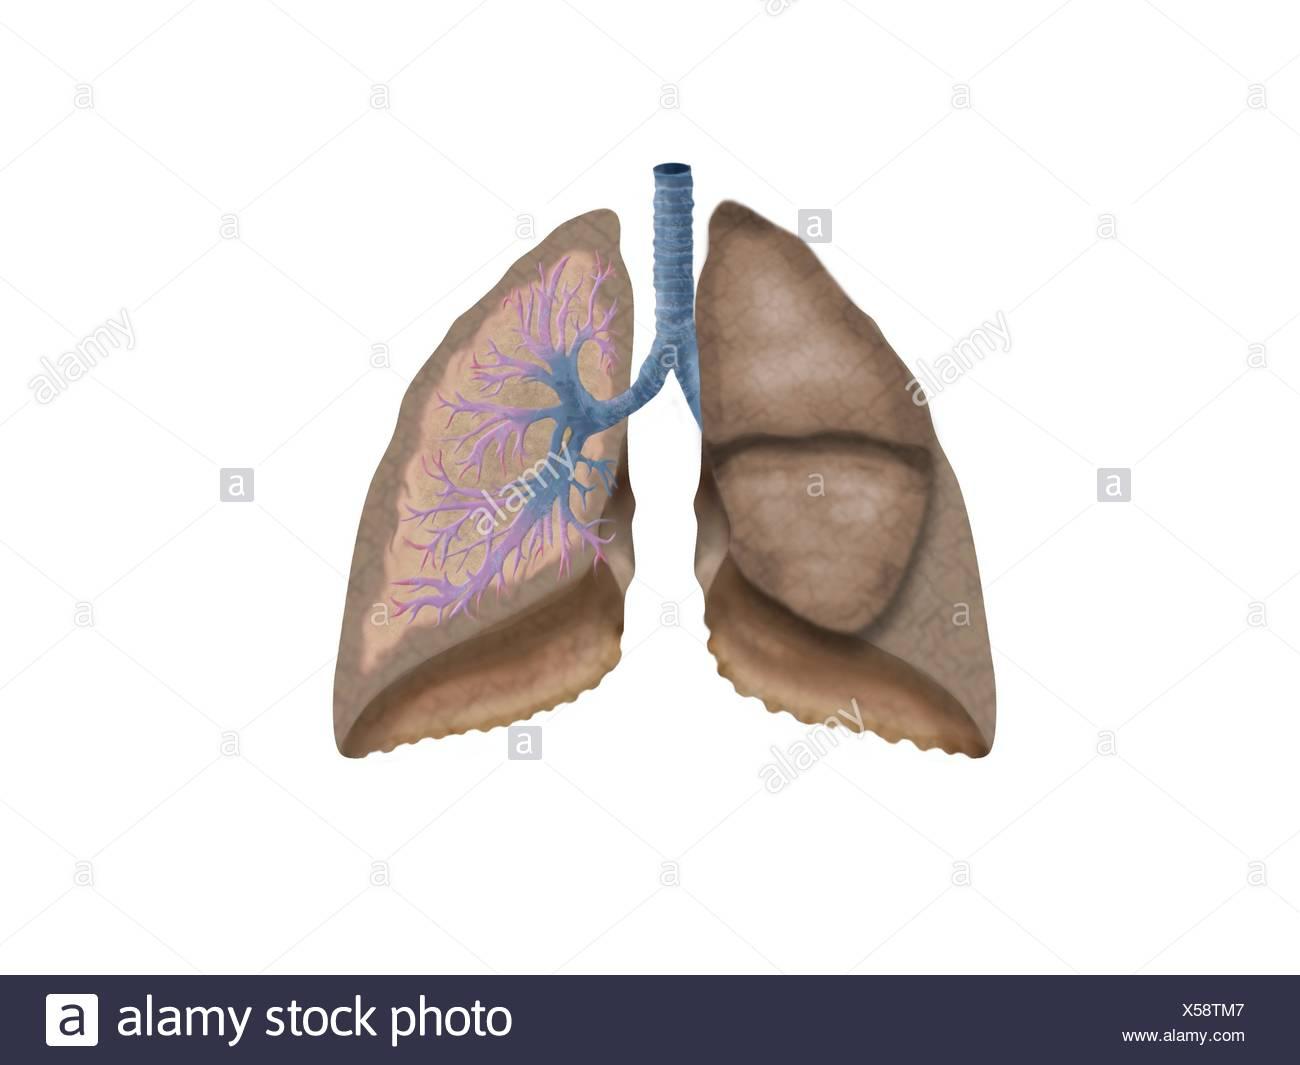 Arterie Stockfotos & Arterie Bilder - Alamy